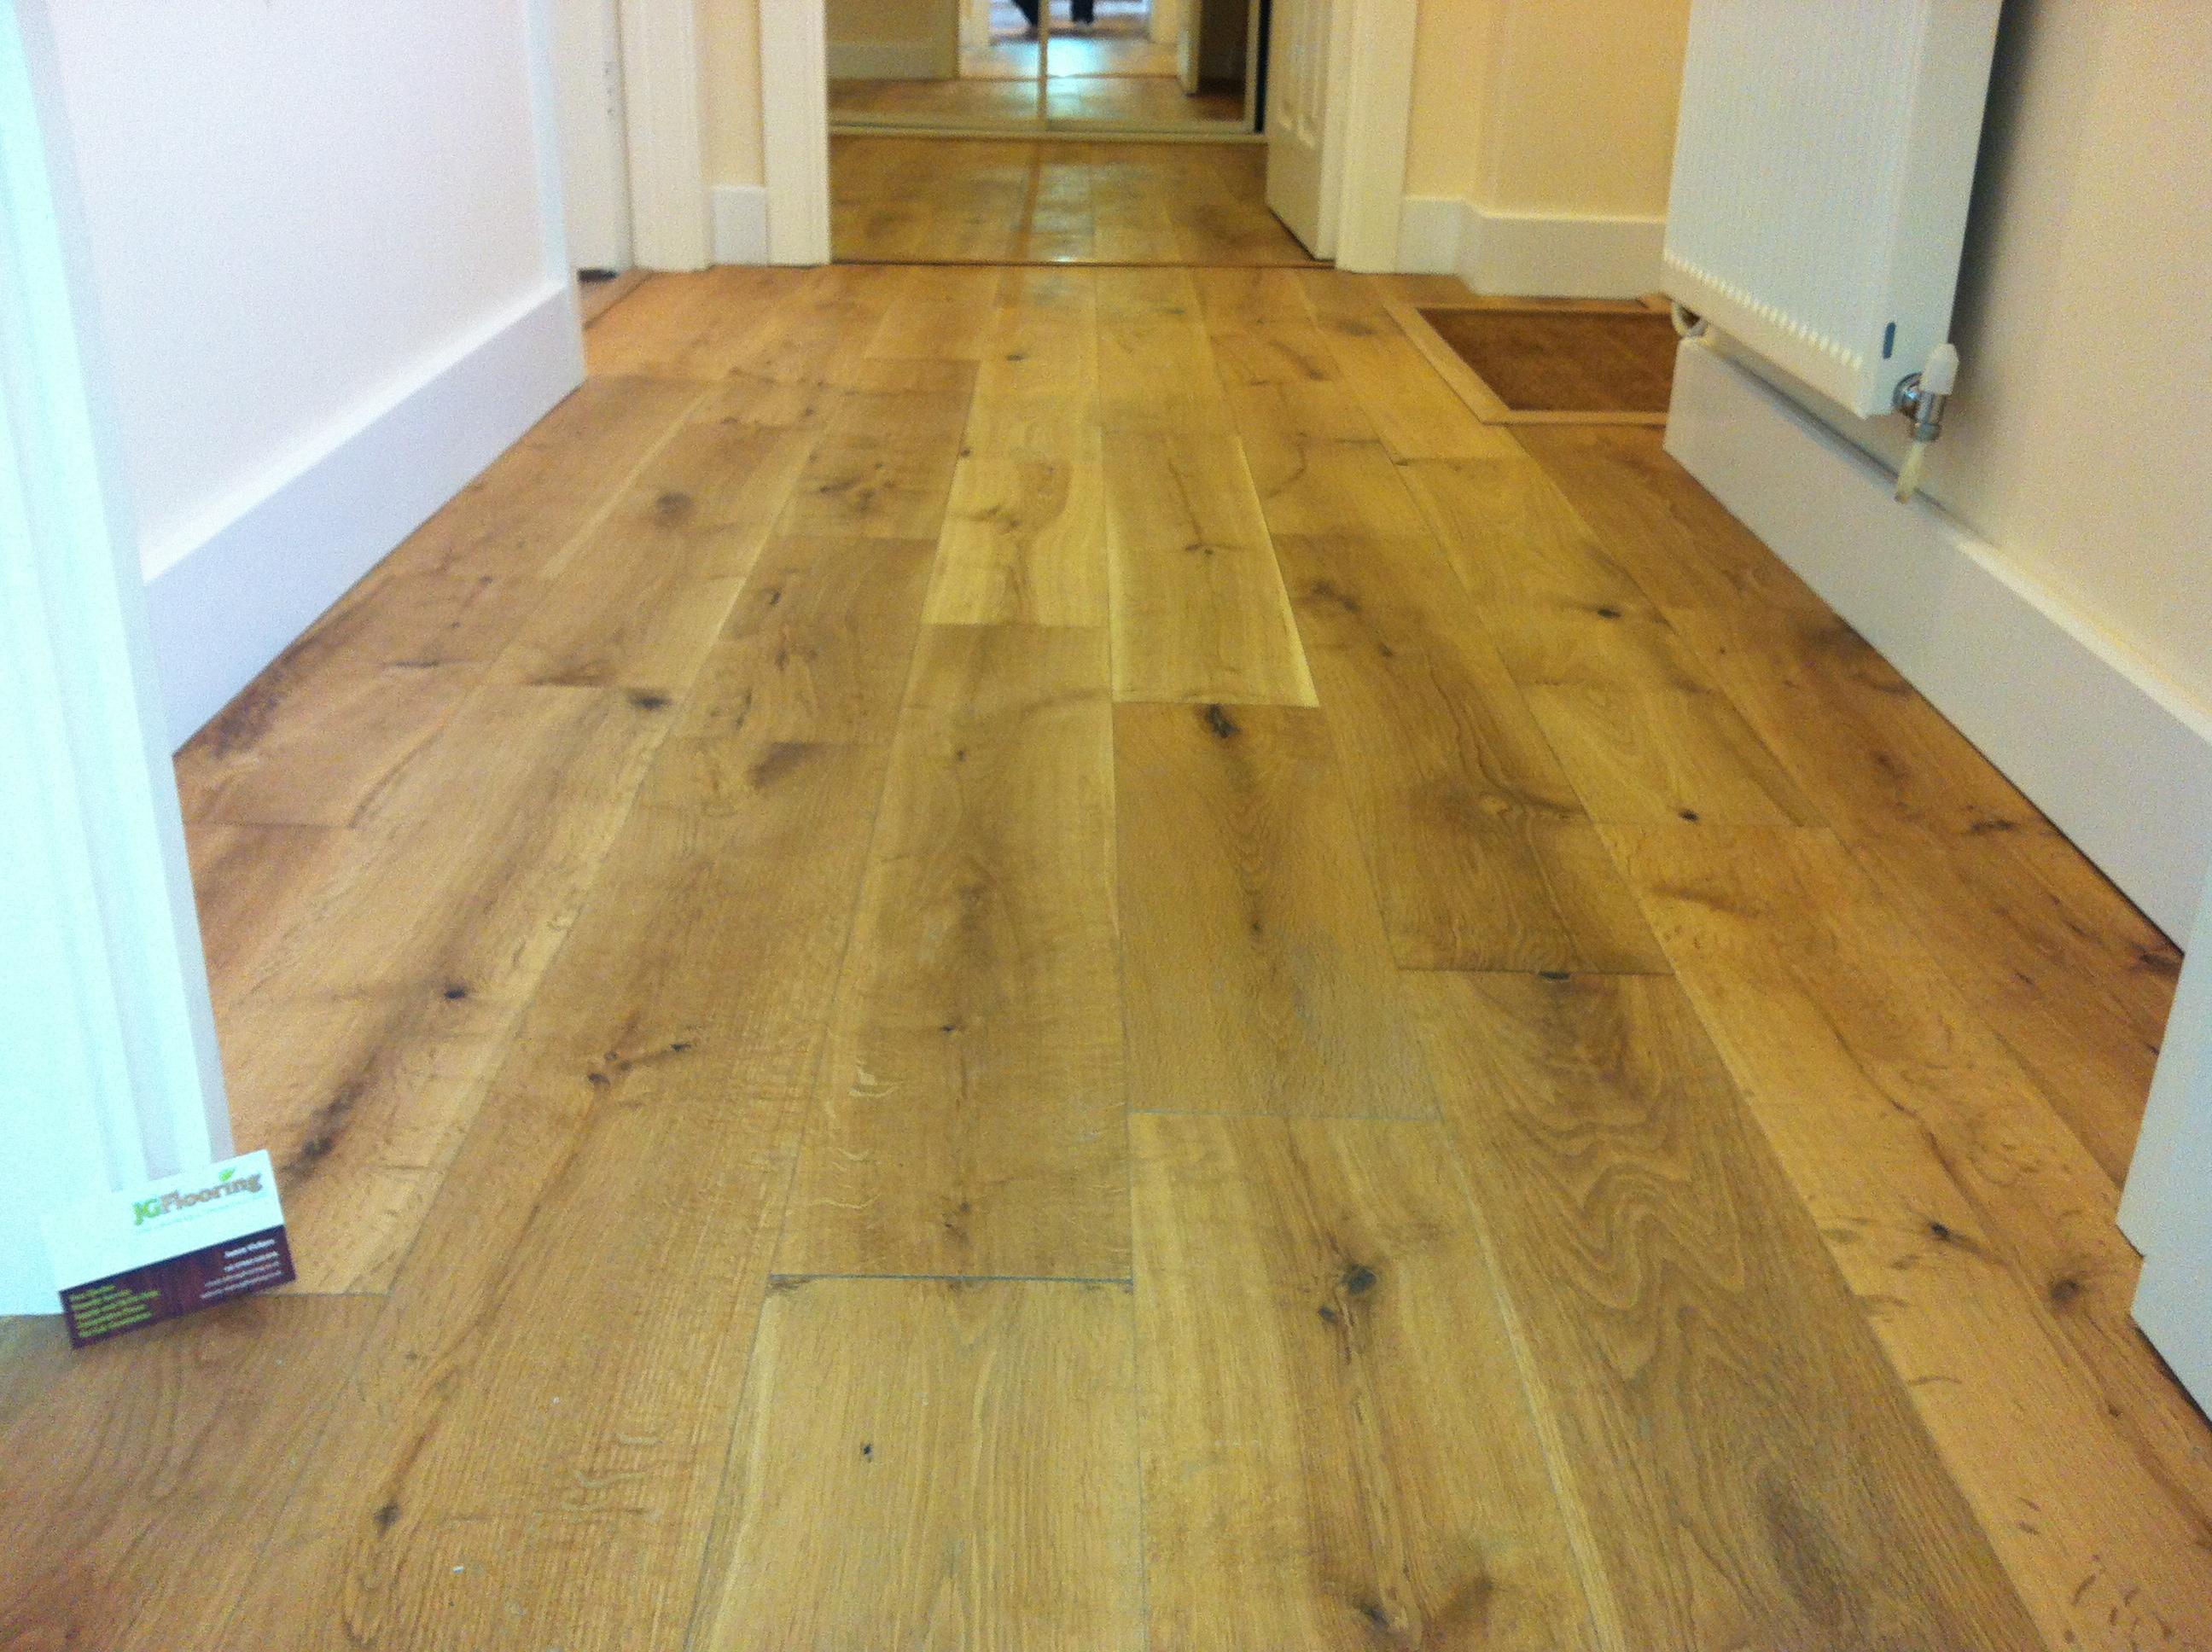 Laminate Flooring Jg, What Are The Disadvantages Of Laminate Flooring